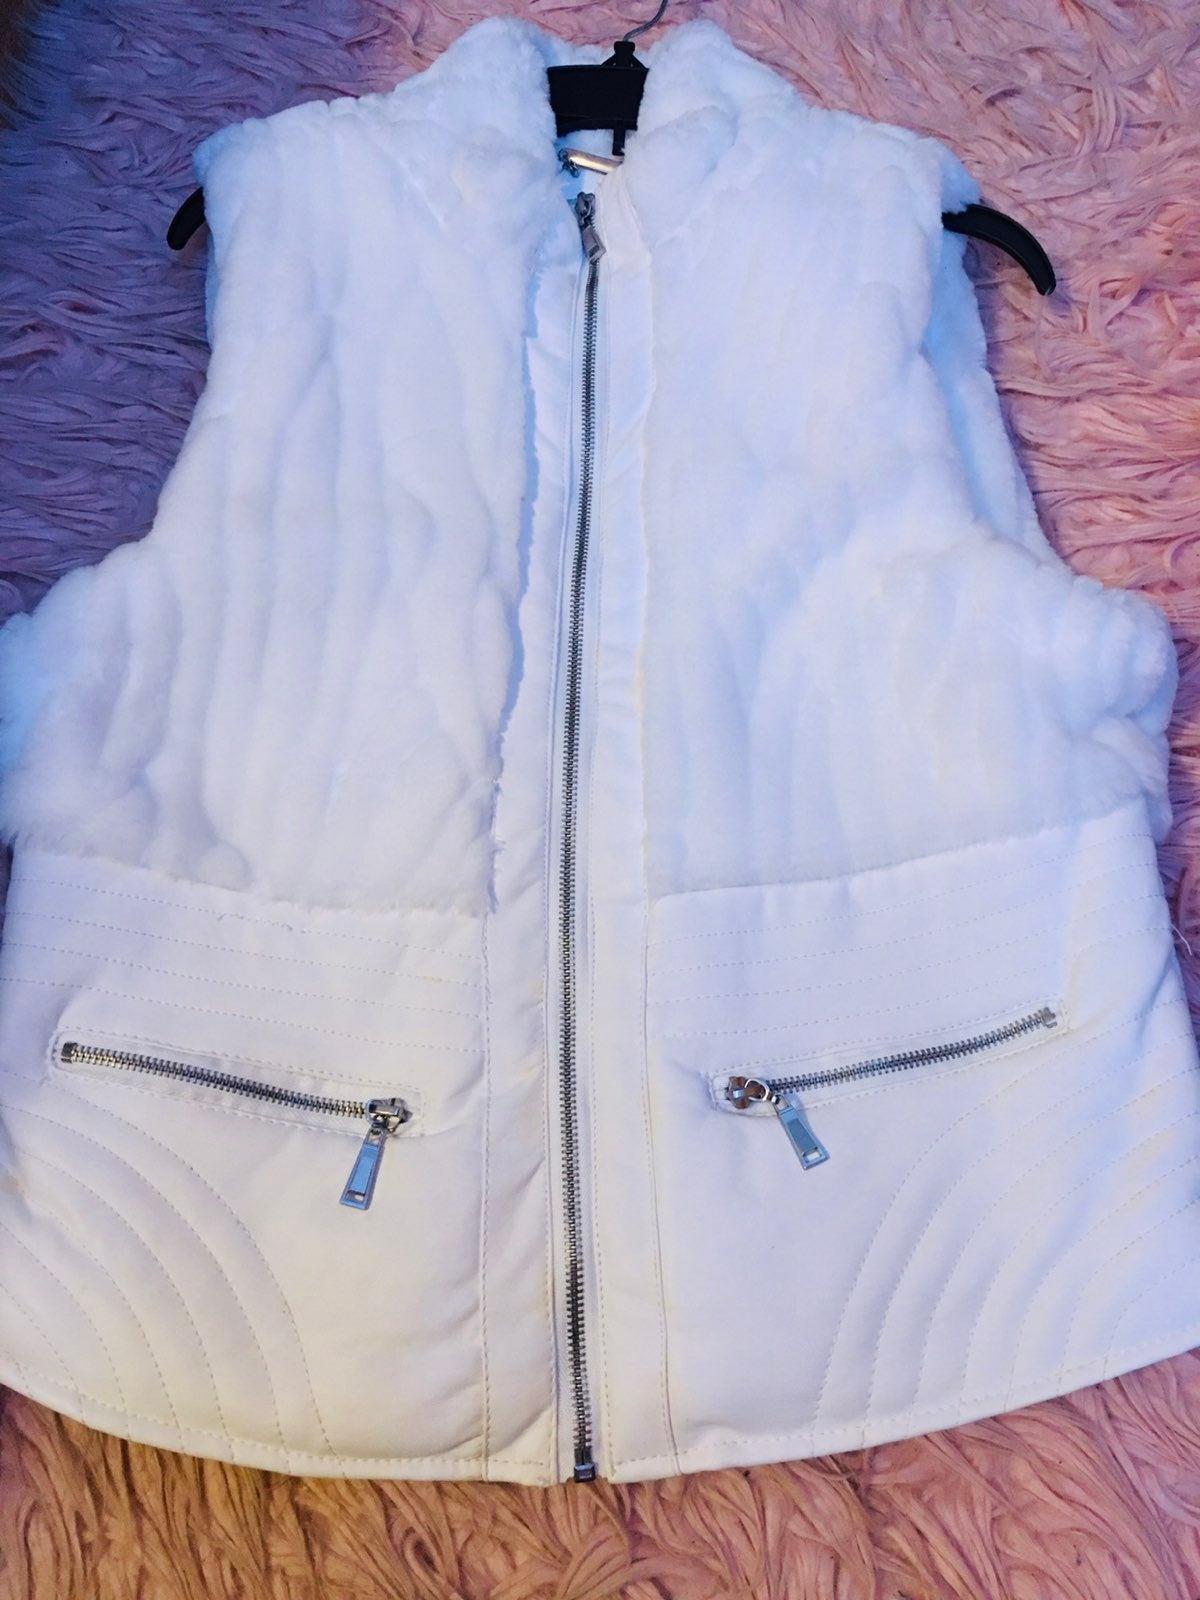 Puffer Vest with zipper packets